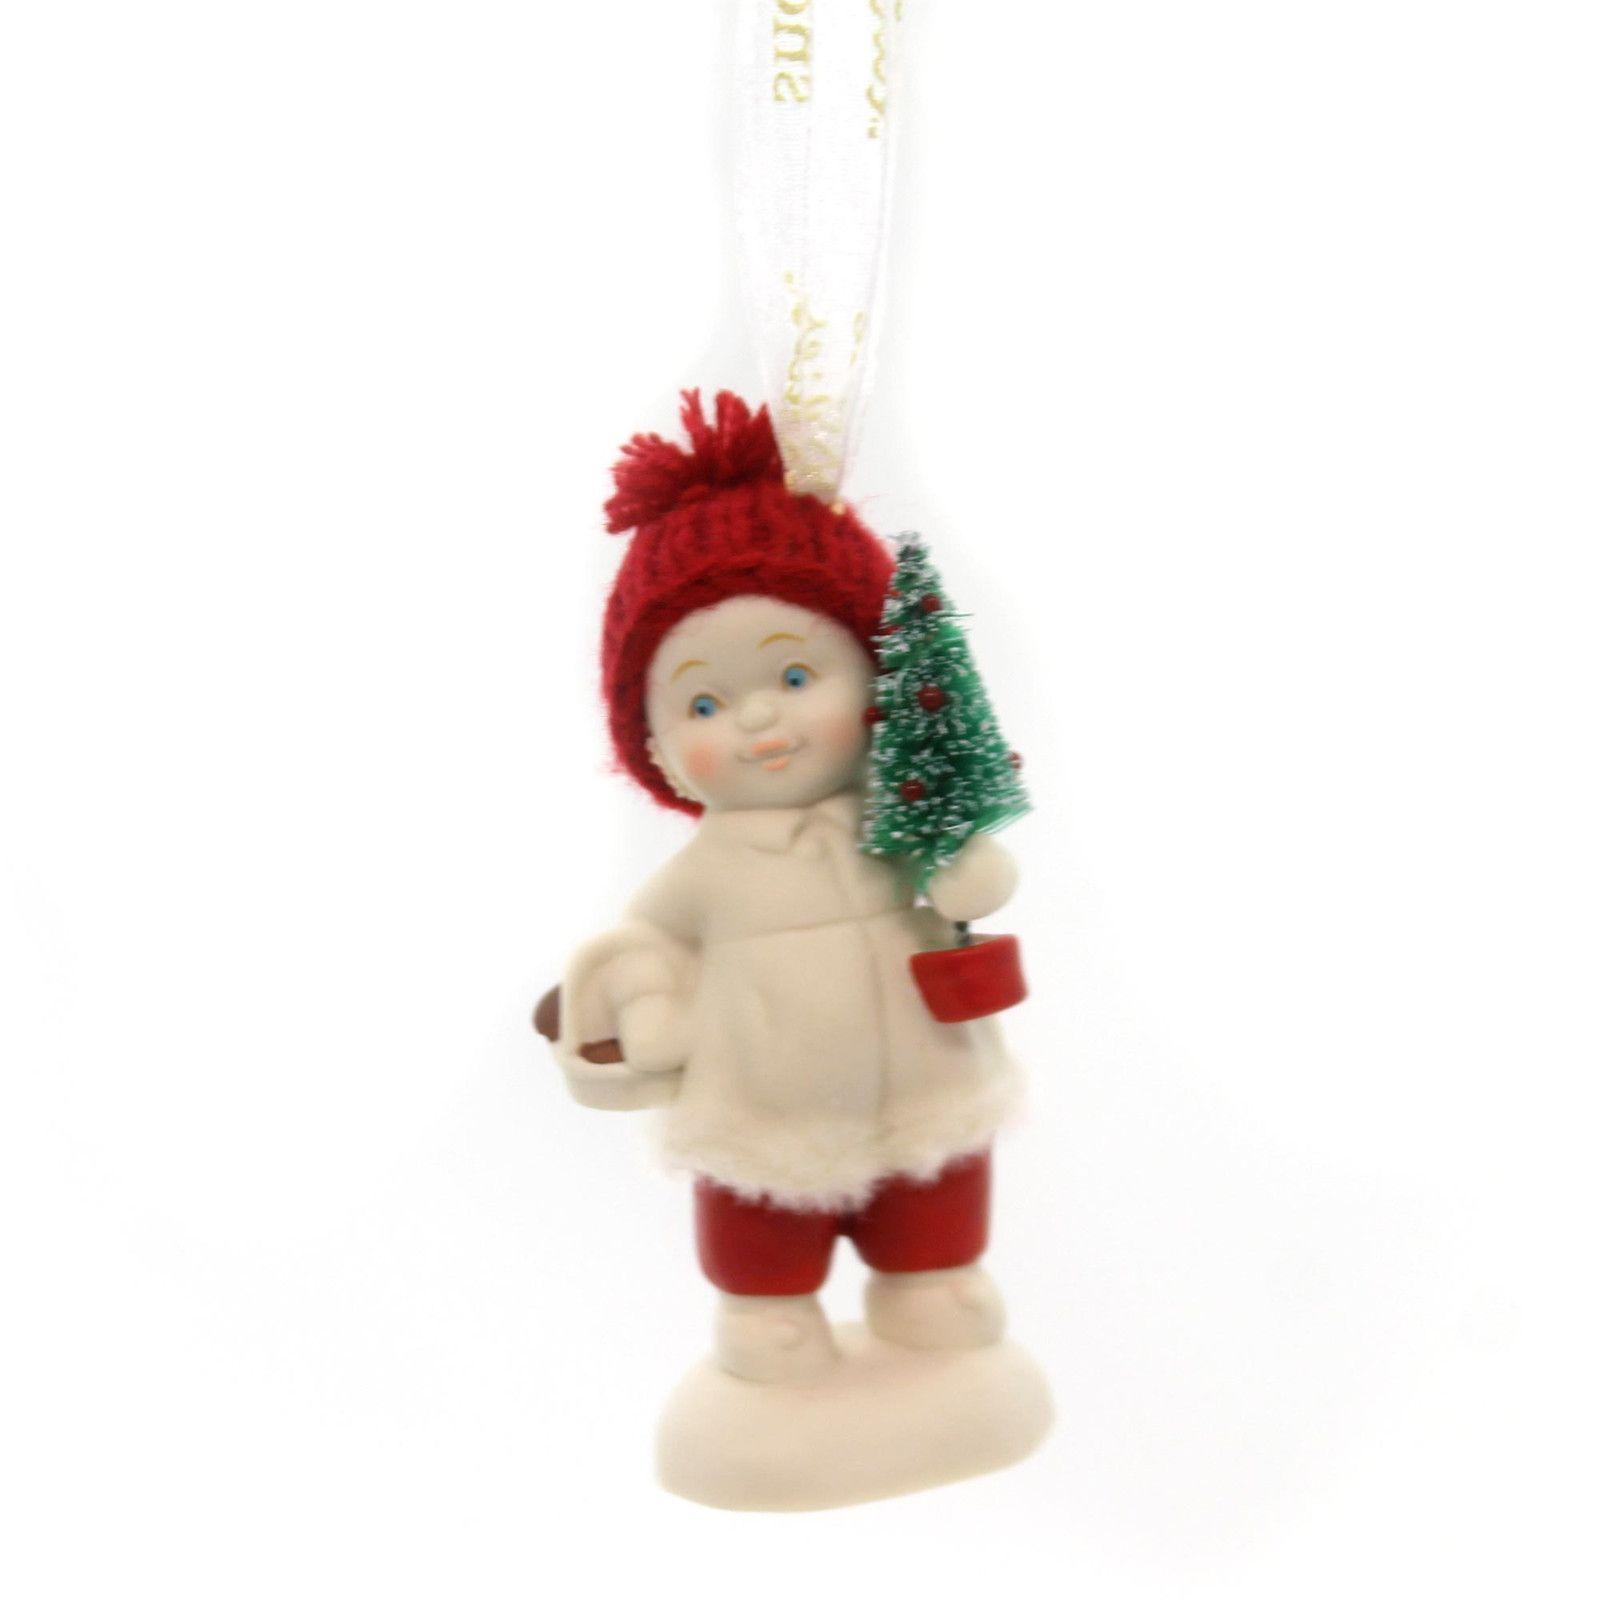 Dept 56 Snowbabies Toting The Tree Christmas Figurine